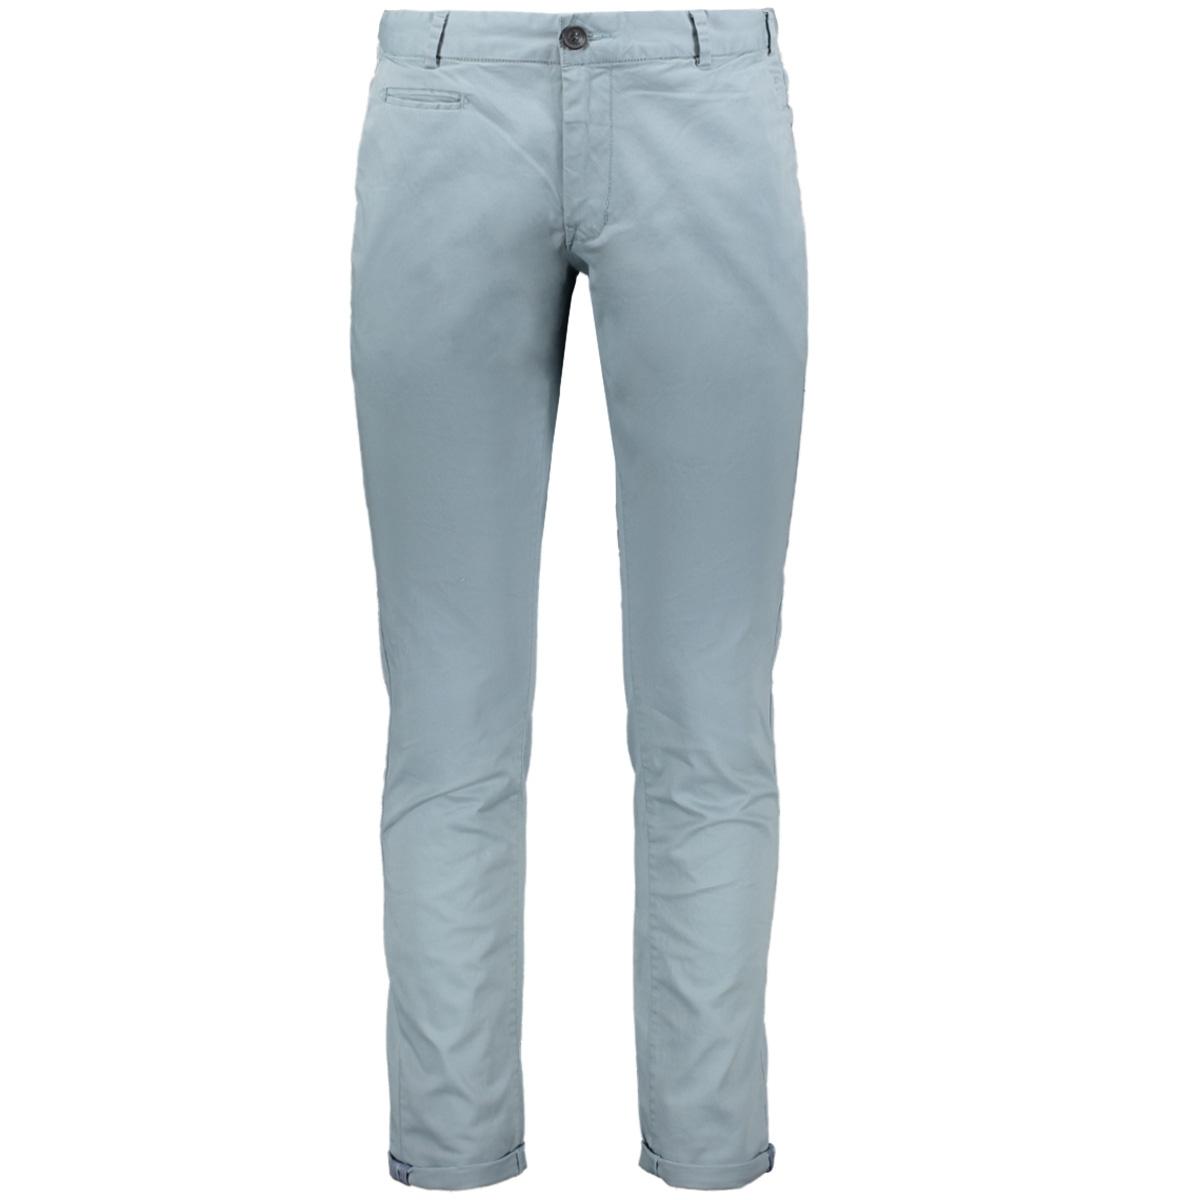 fermo gs010150 garcia broek 3089 mineral blue